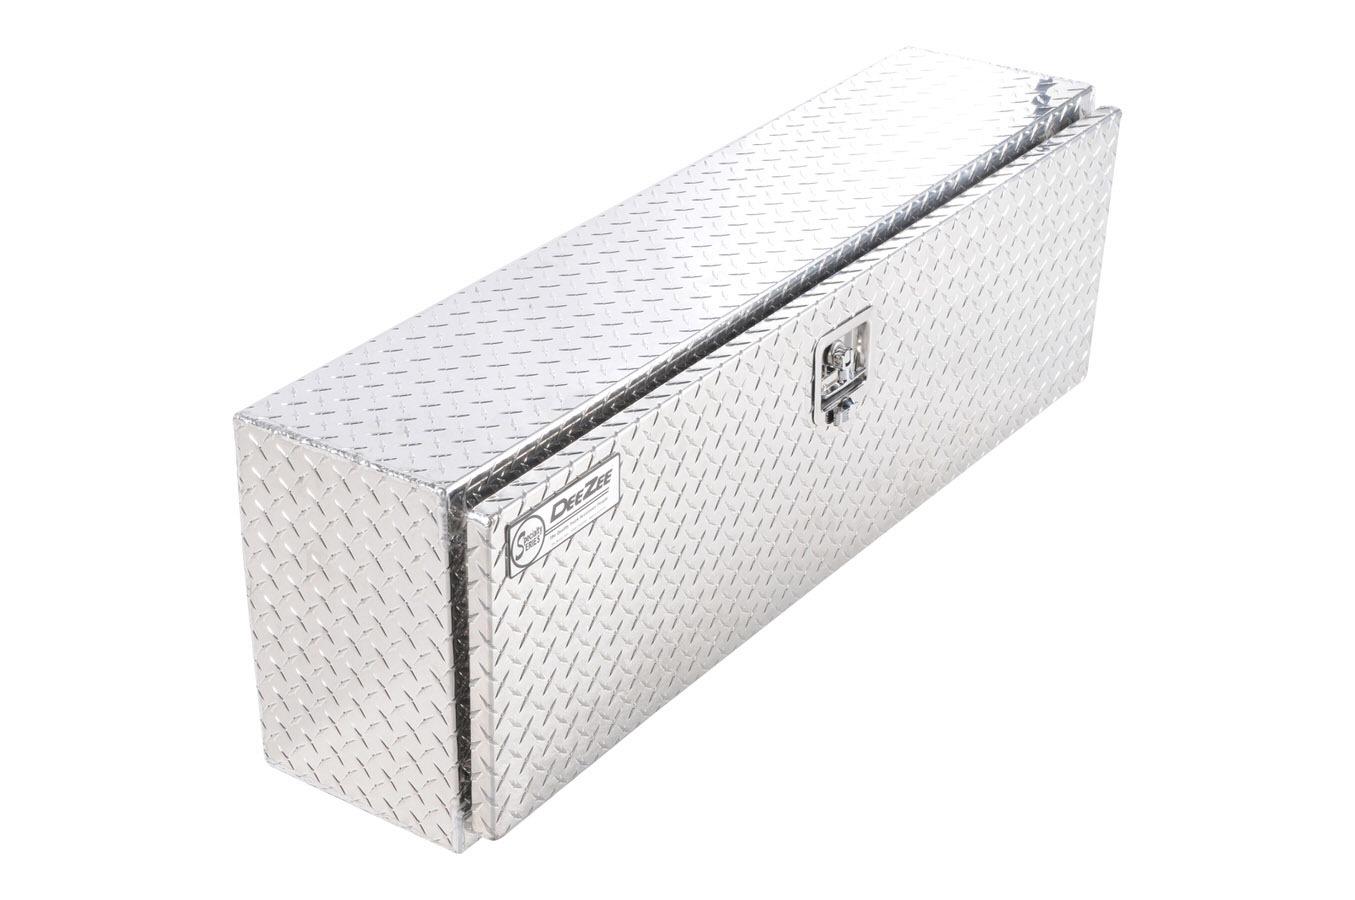 Dee Zee Tool Box - Specialty Top sider BT Aluminum